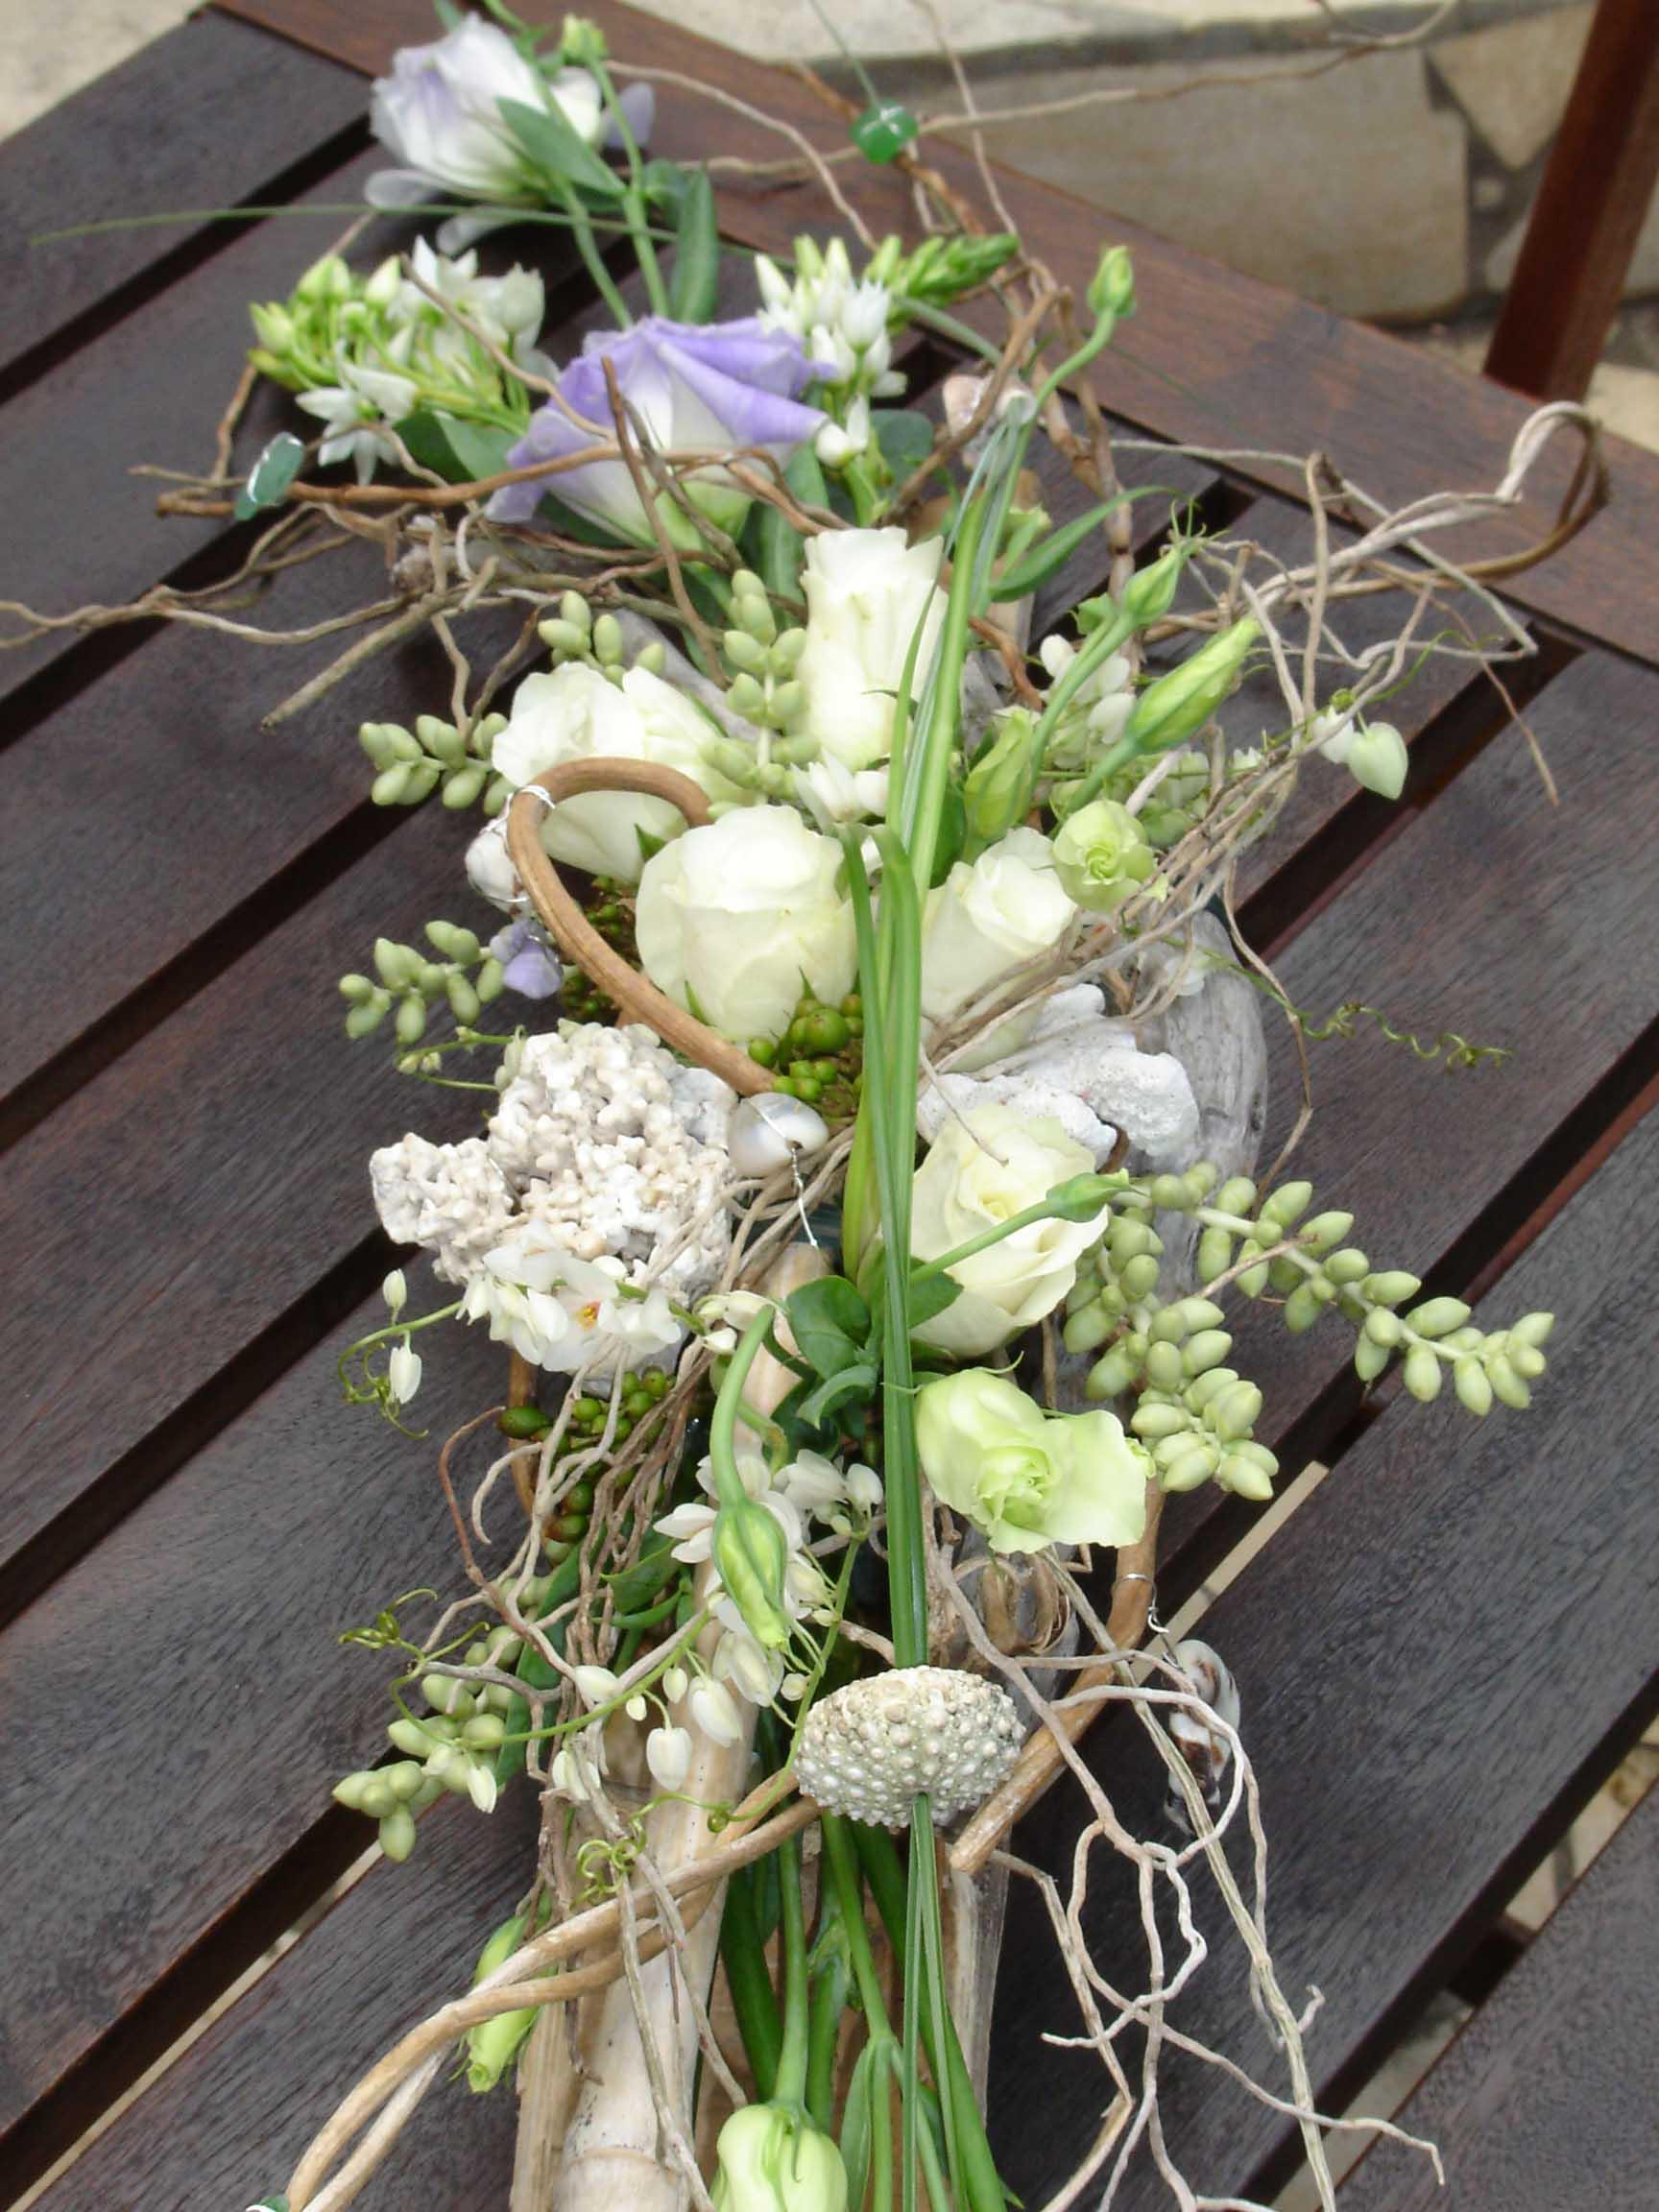 Tendance nature cours d art floral for Table 6 usmc